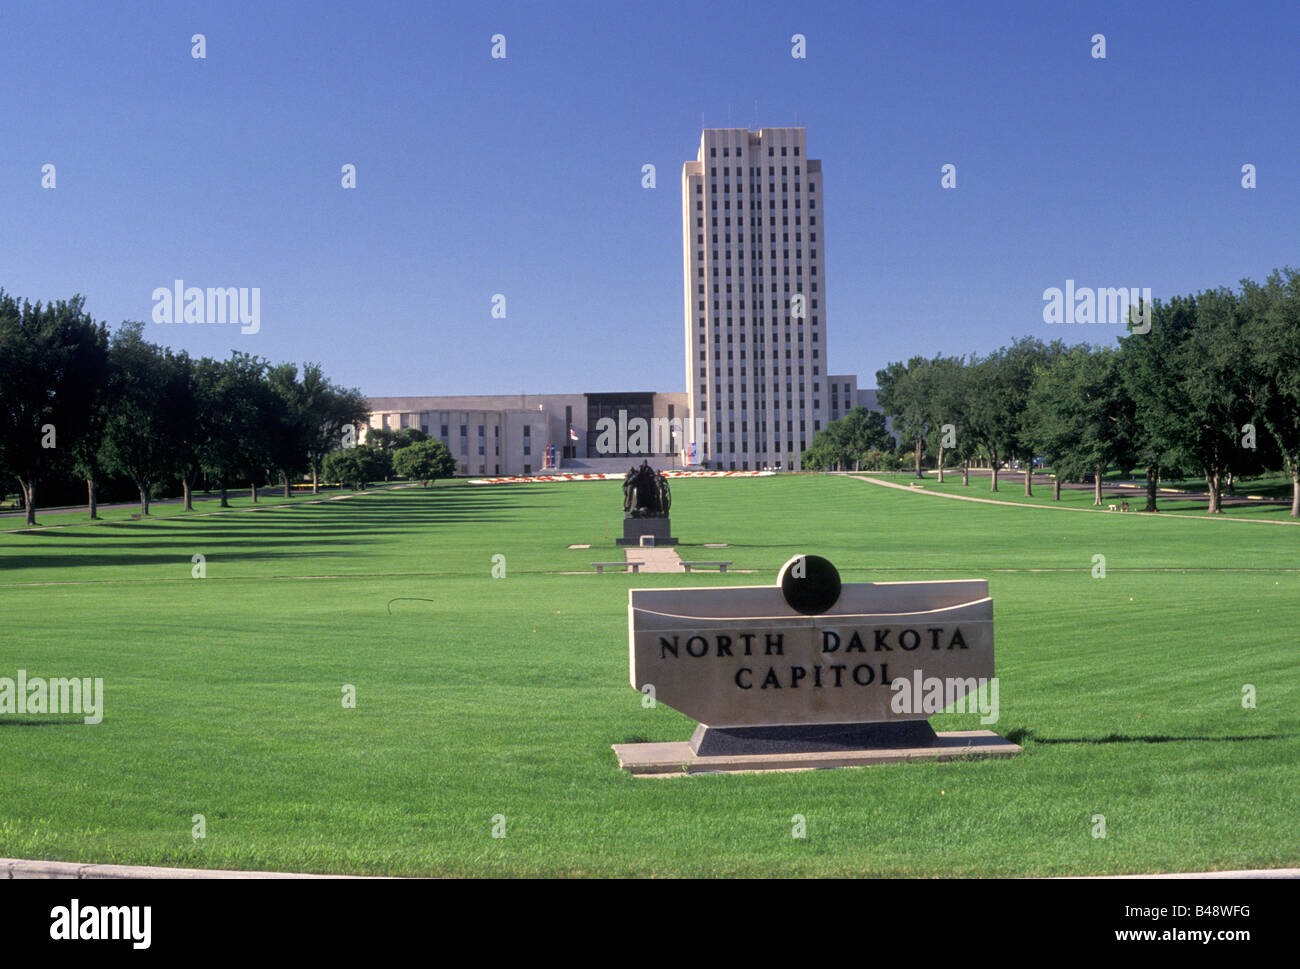 State Capitol building Bismarck North Dakota - Stock Image